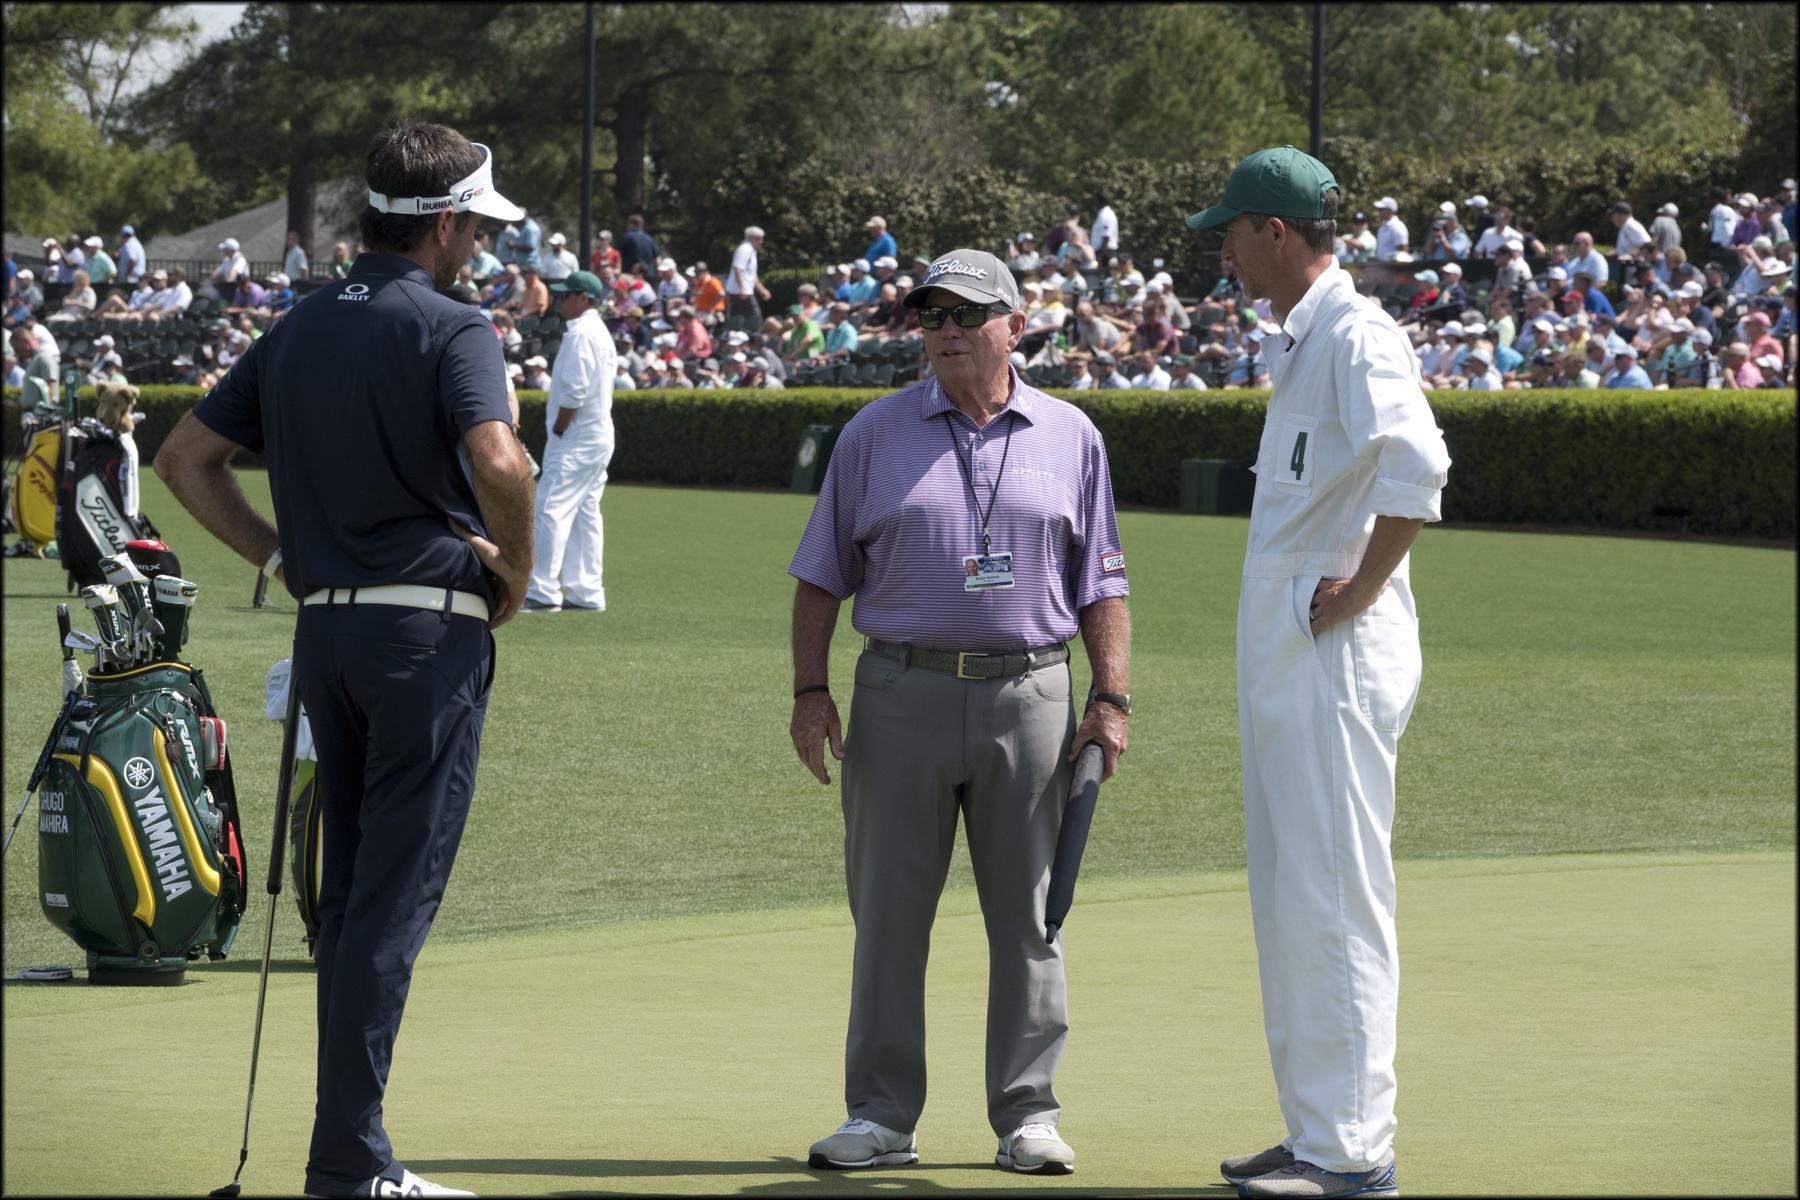 augusta national golf course  u2013 the masters  u2013 bucket list  ud83d uddf8